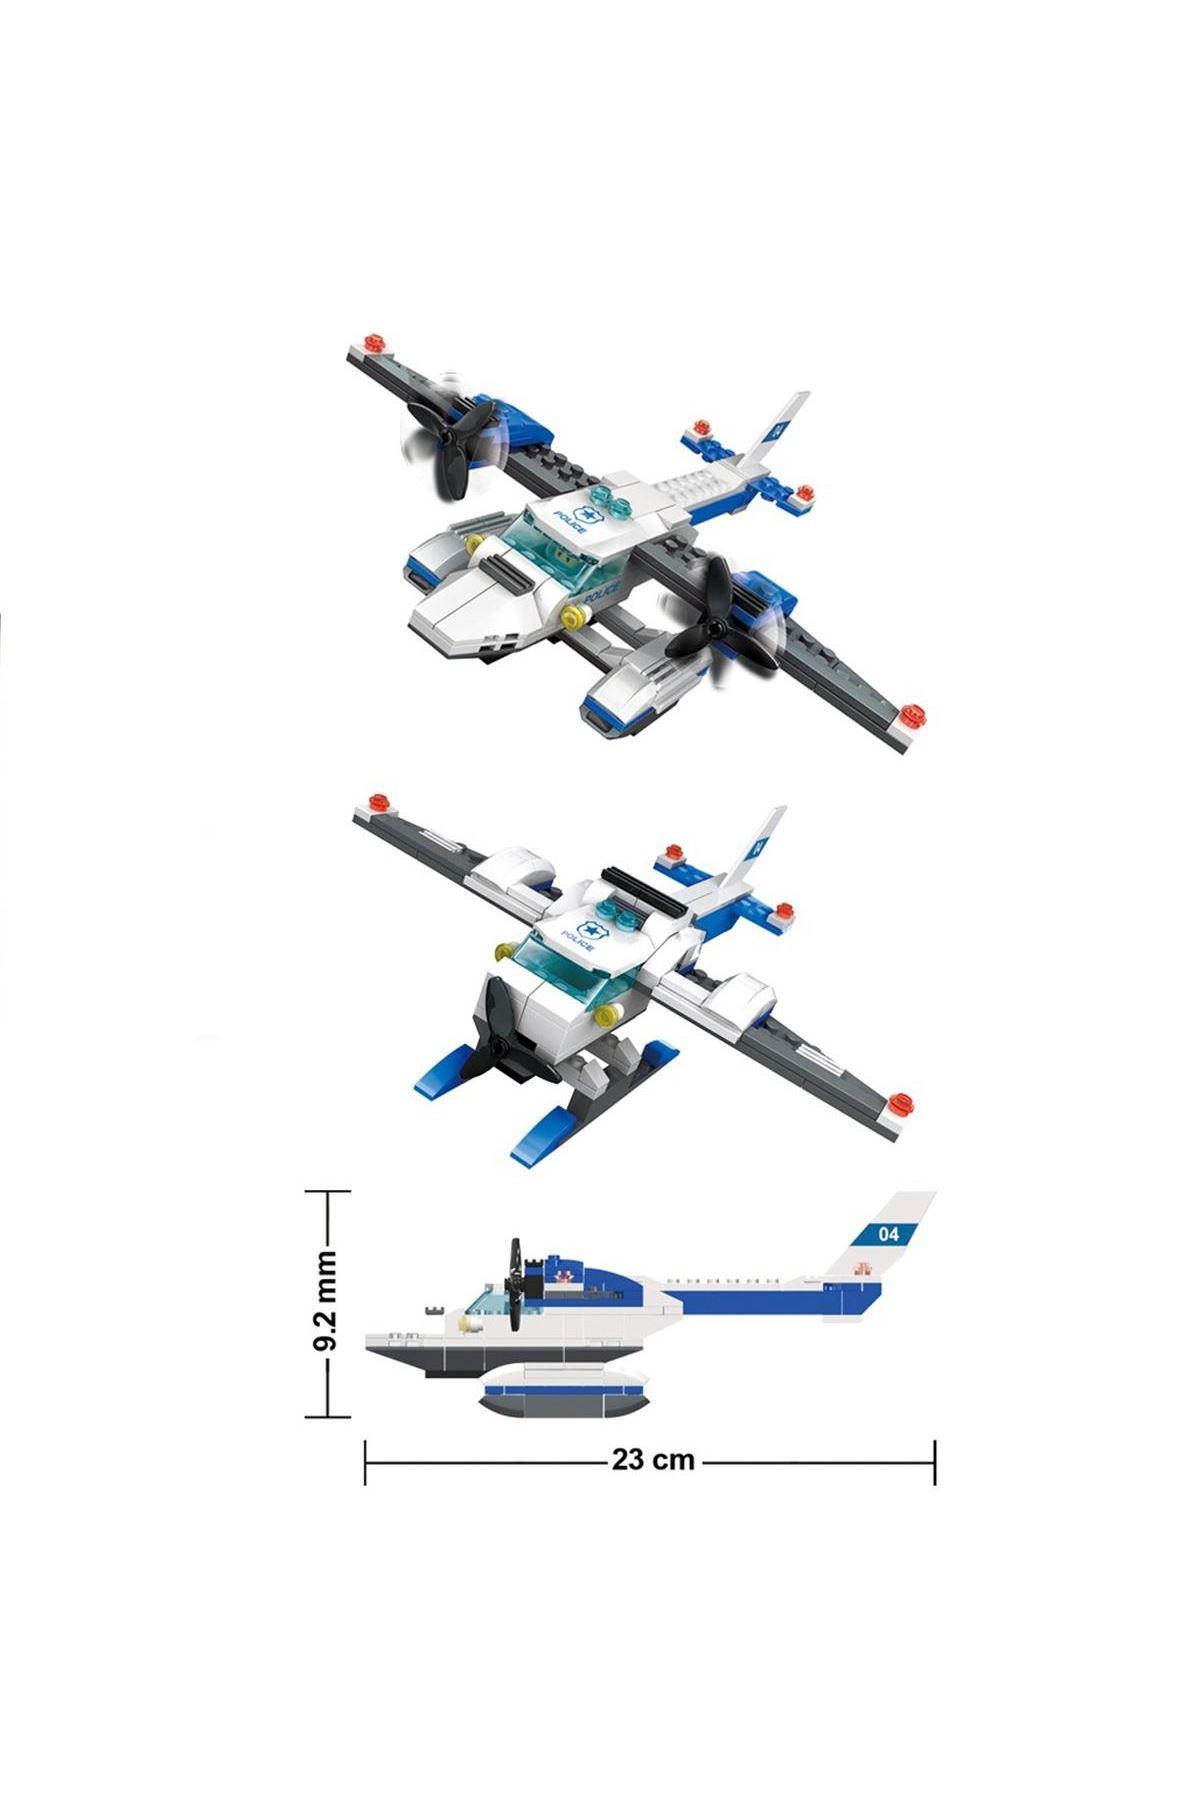 Galtoys Polis Sahil Güvenlik Uçağı 3İn1 174 Parça GAL-51014